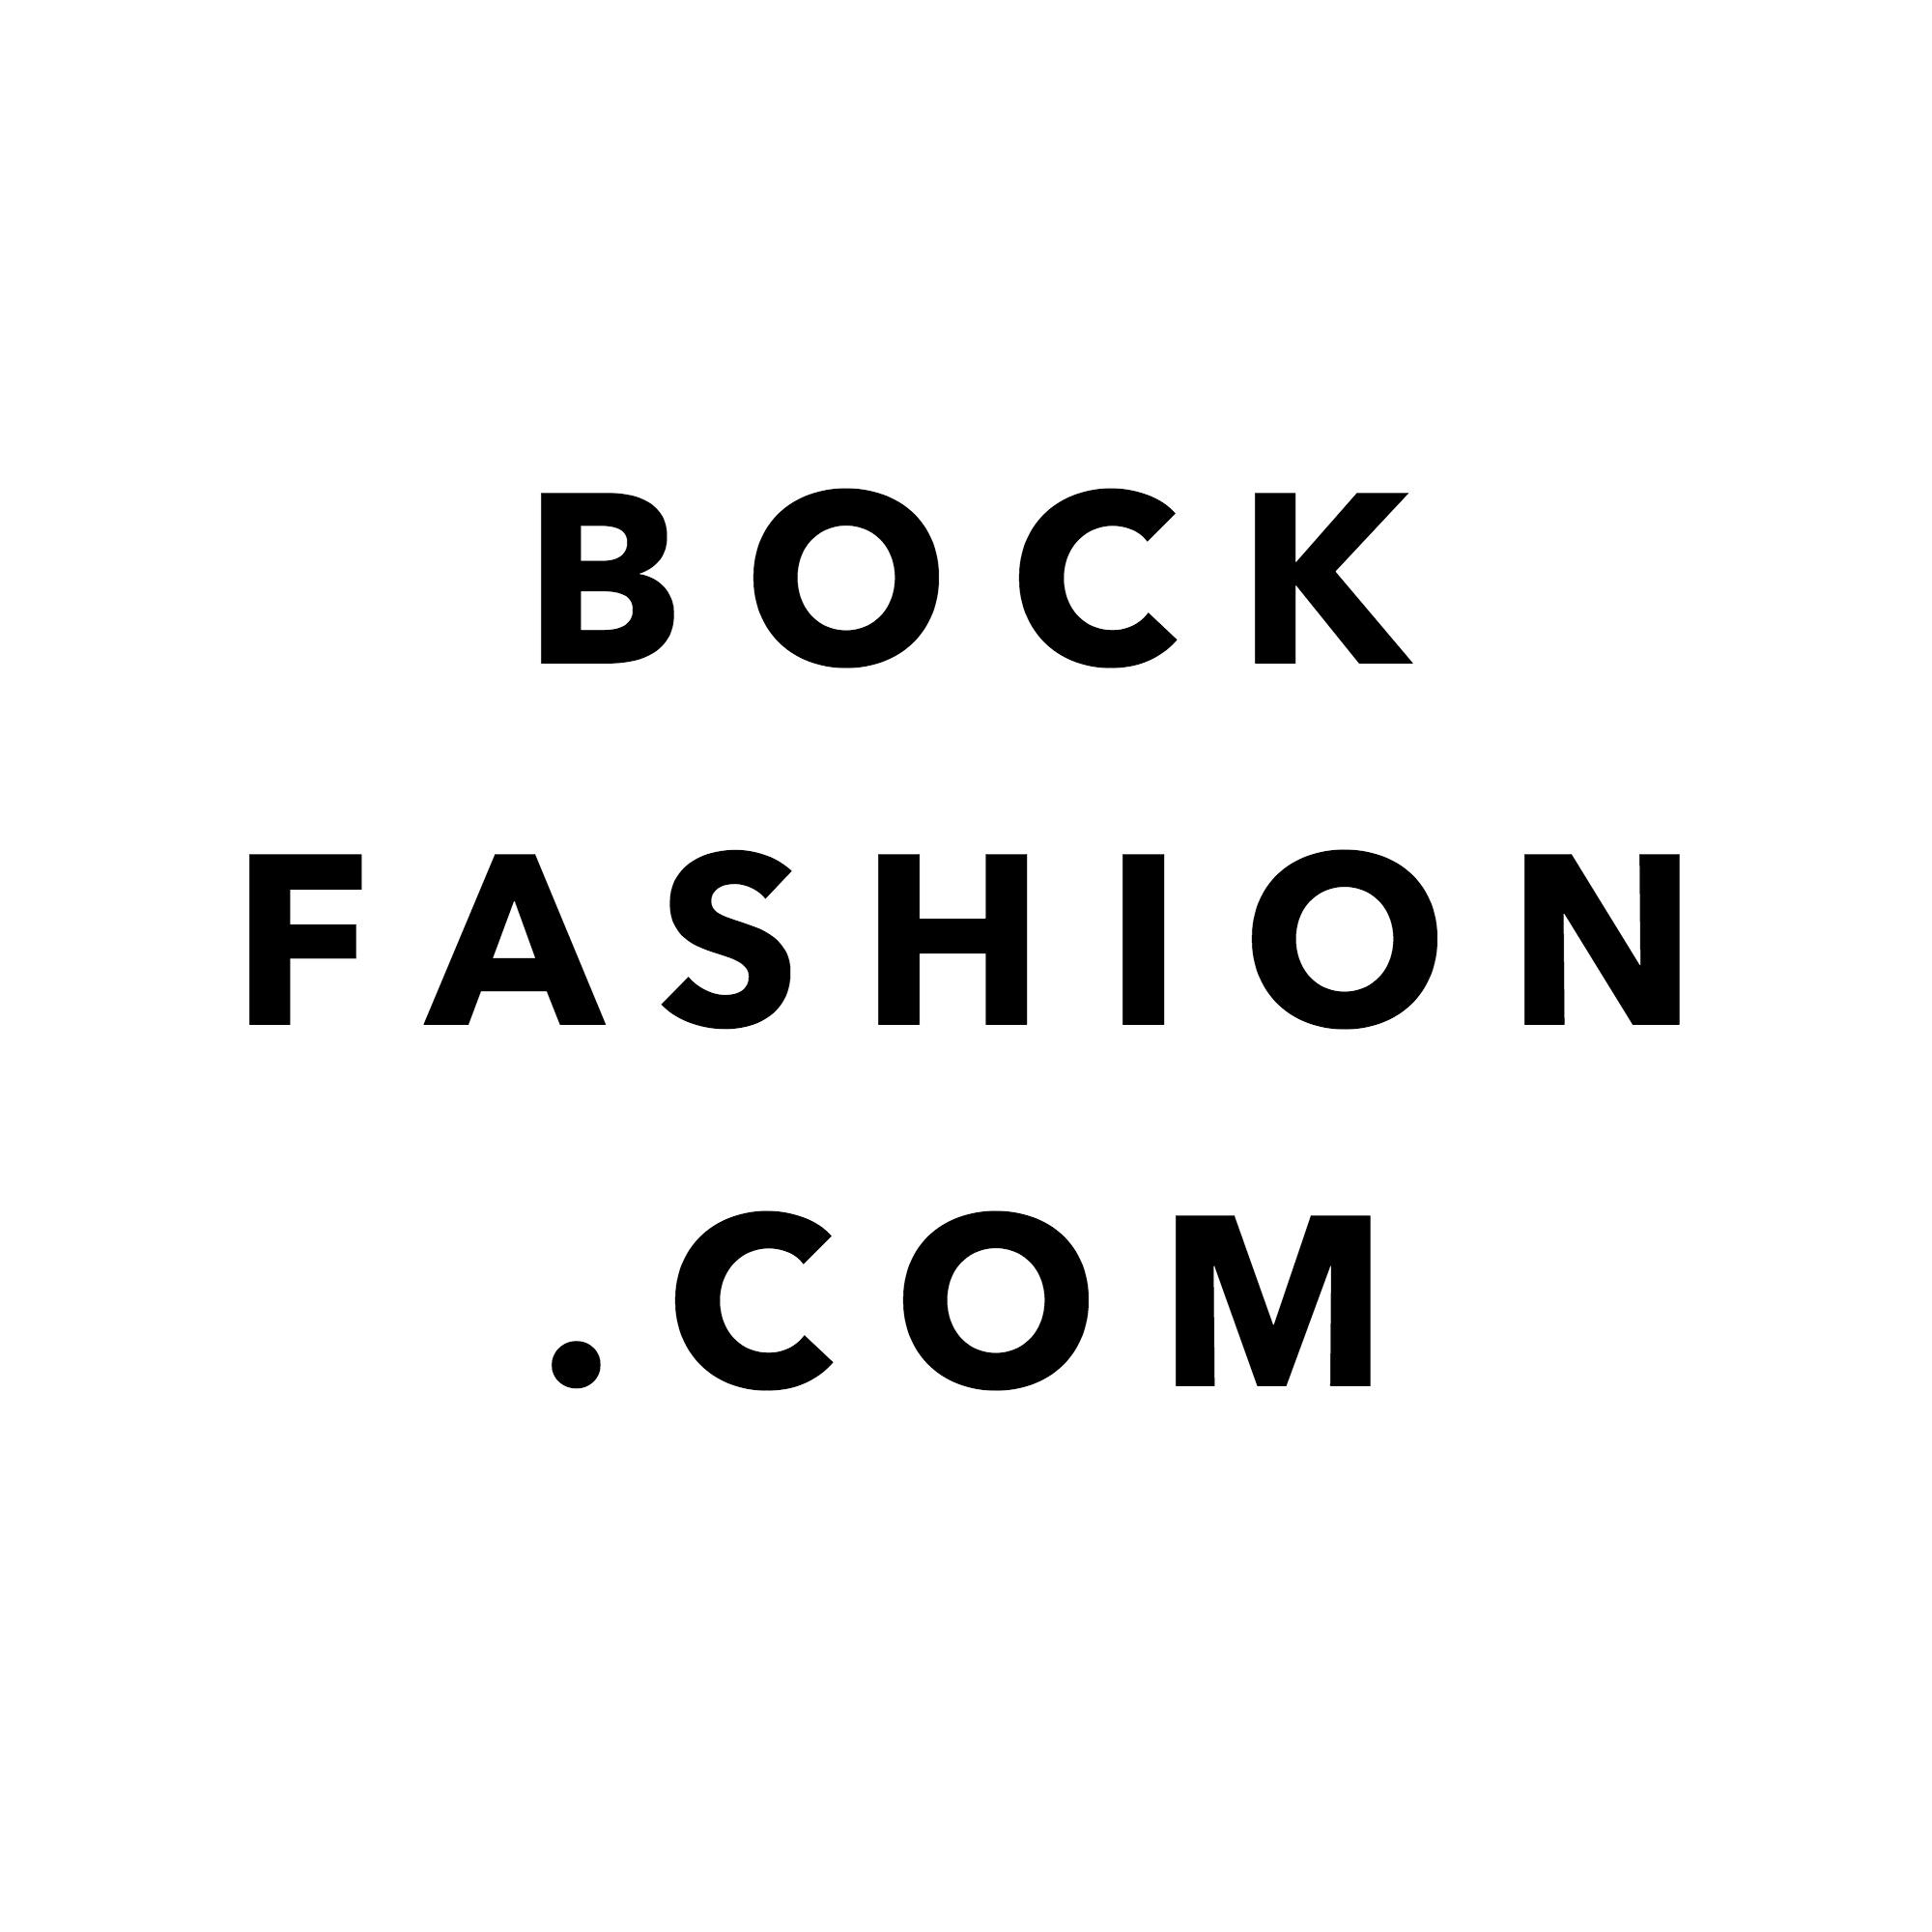 bockfashion.com.jpg